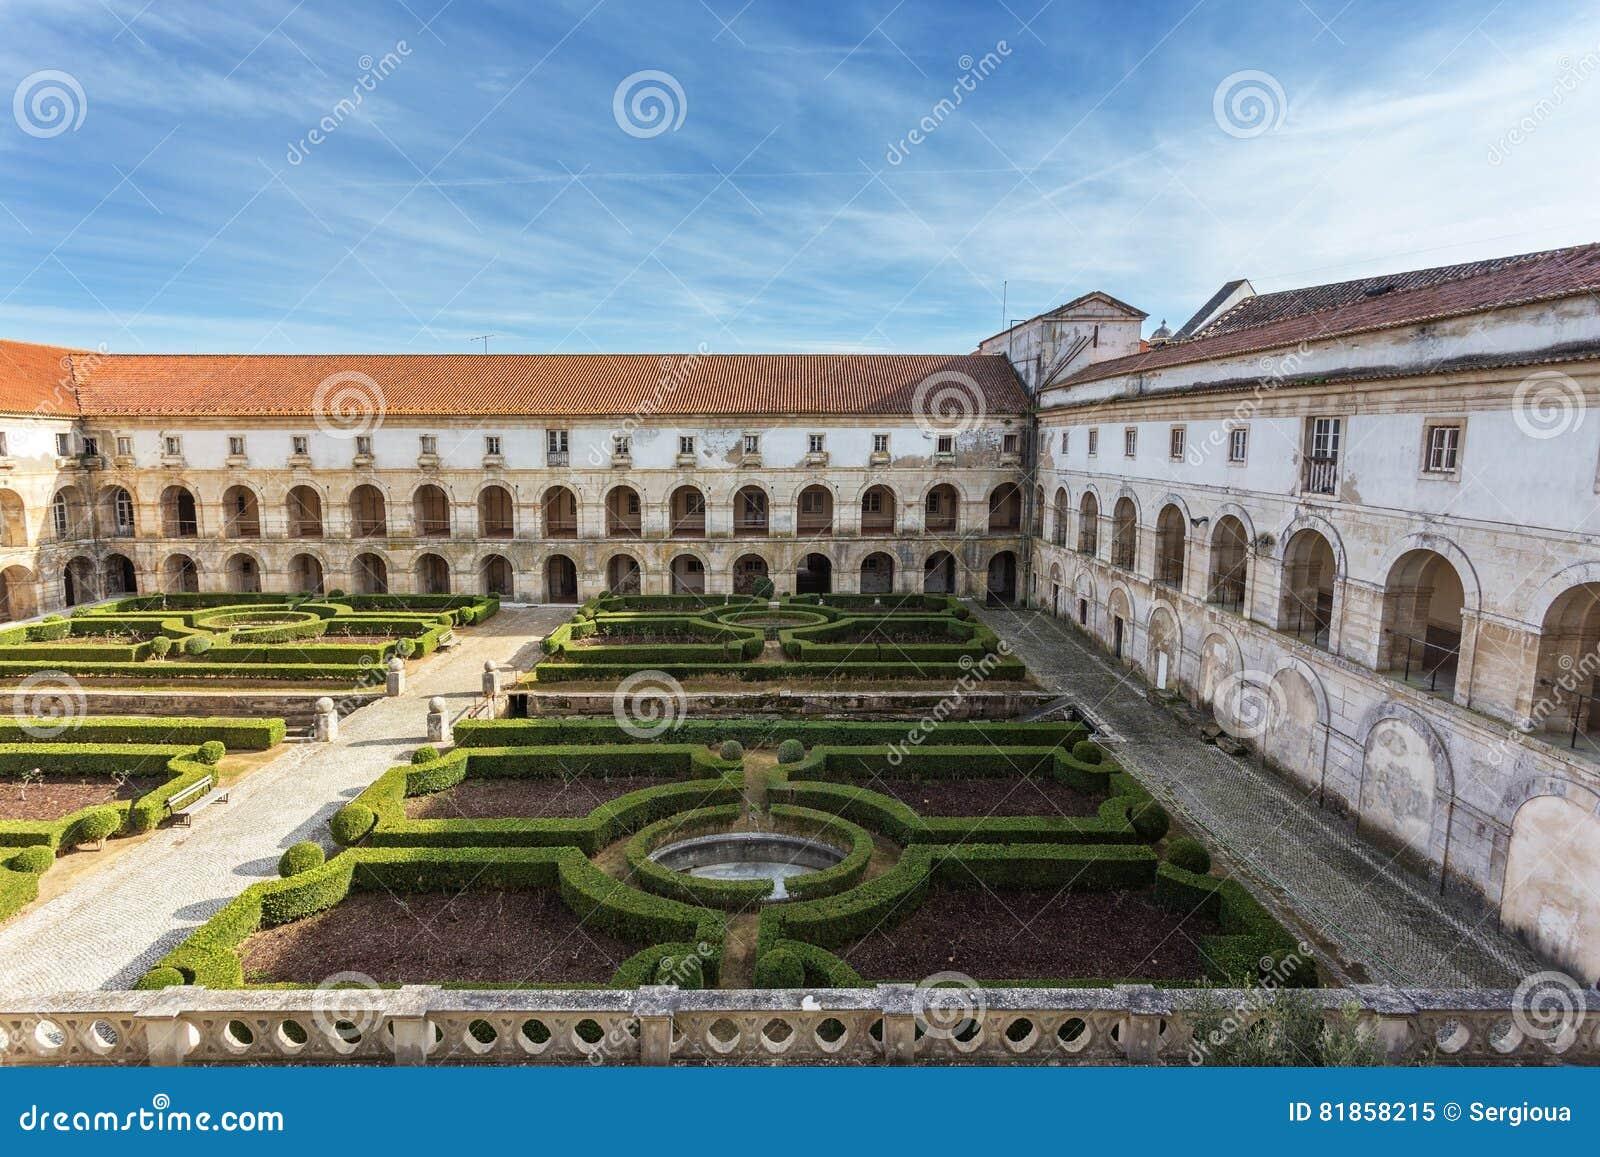 Garden Decoration inner courtyard of the castle Alcobaca